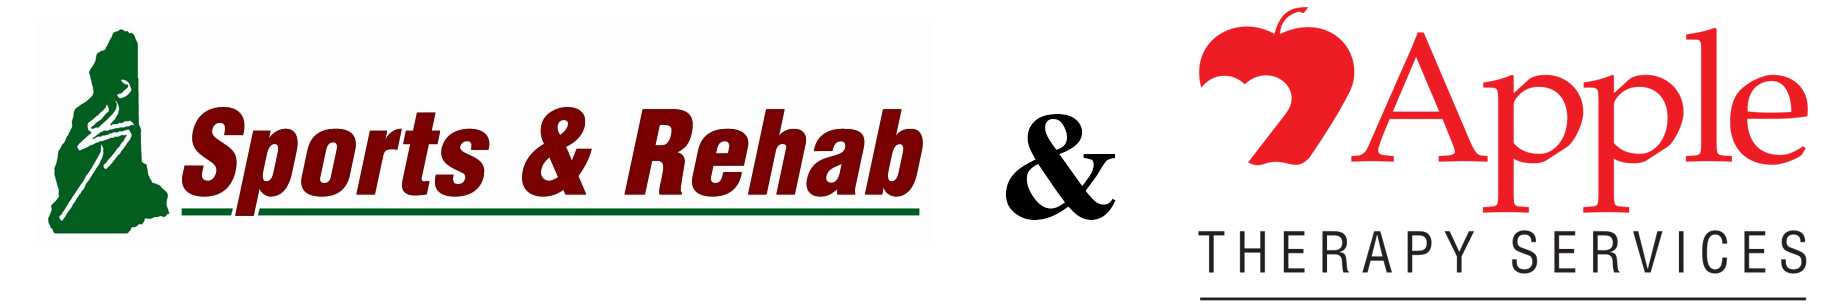 Sports & Rehab&Apple